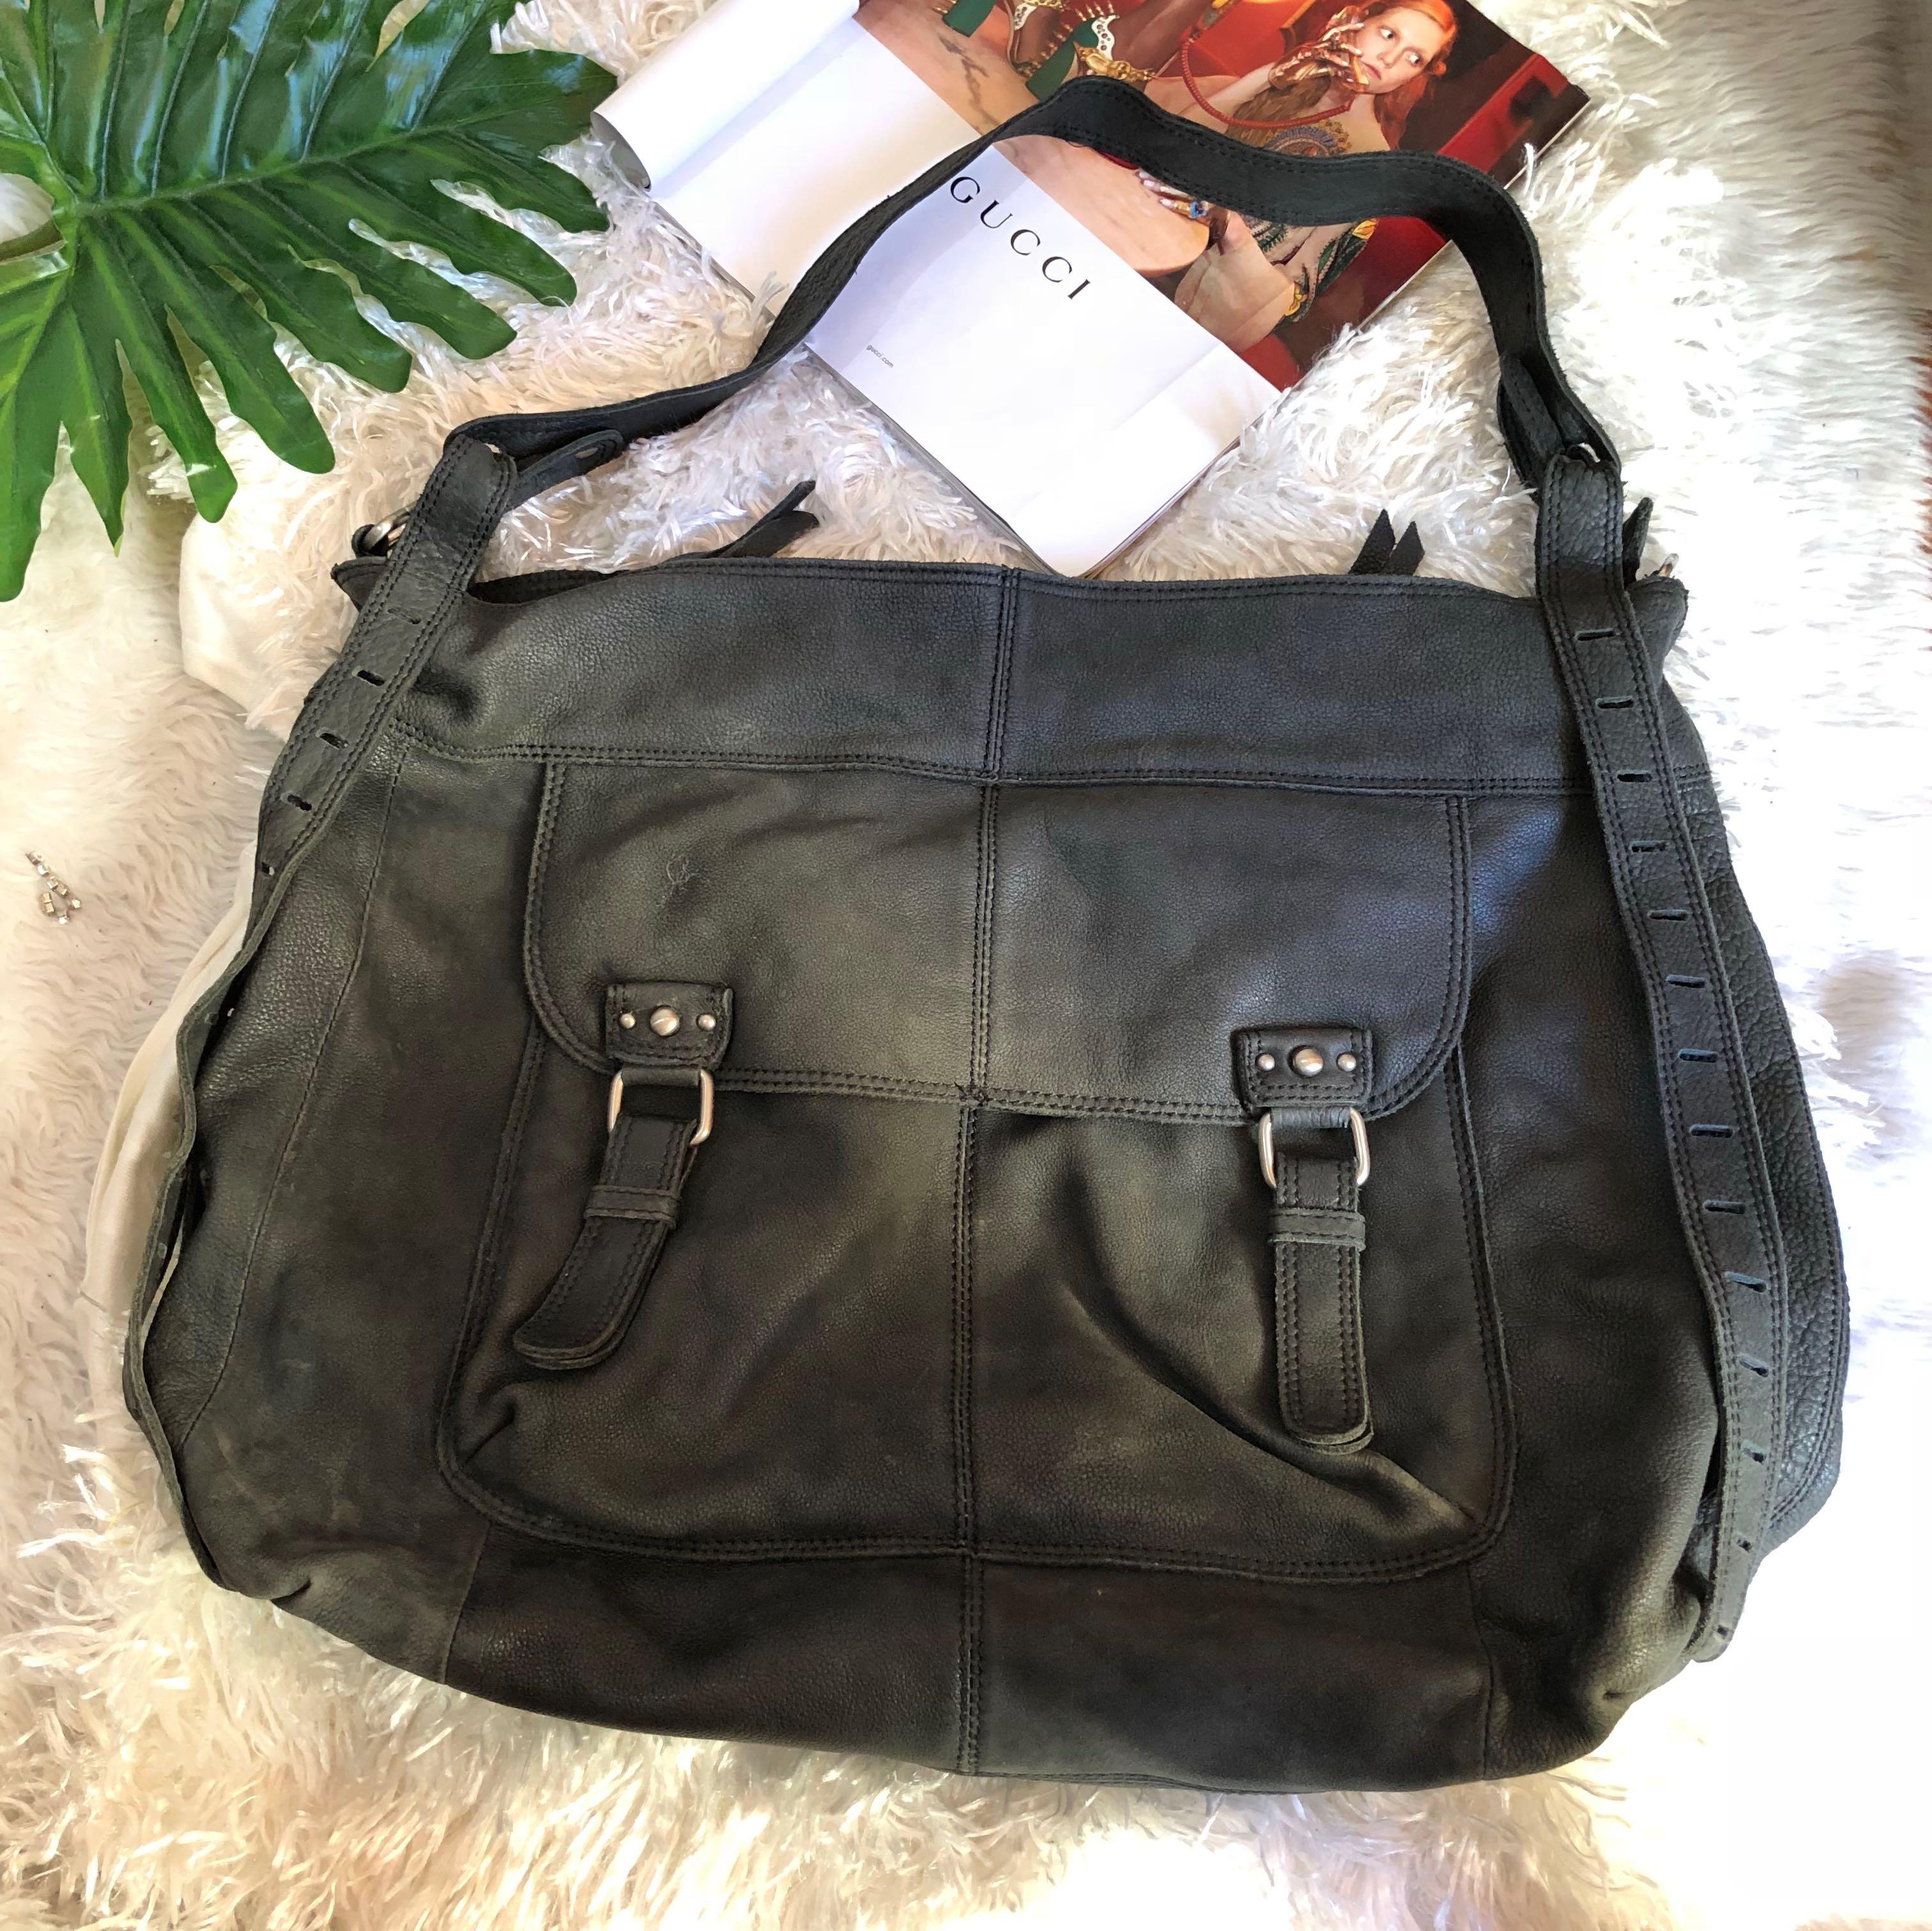 065f00105ec0 ️CLEARANCE SALE‼ Leather Bag